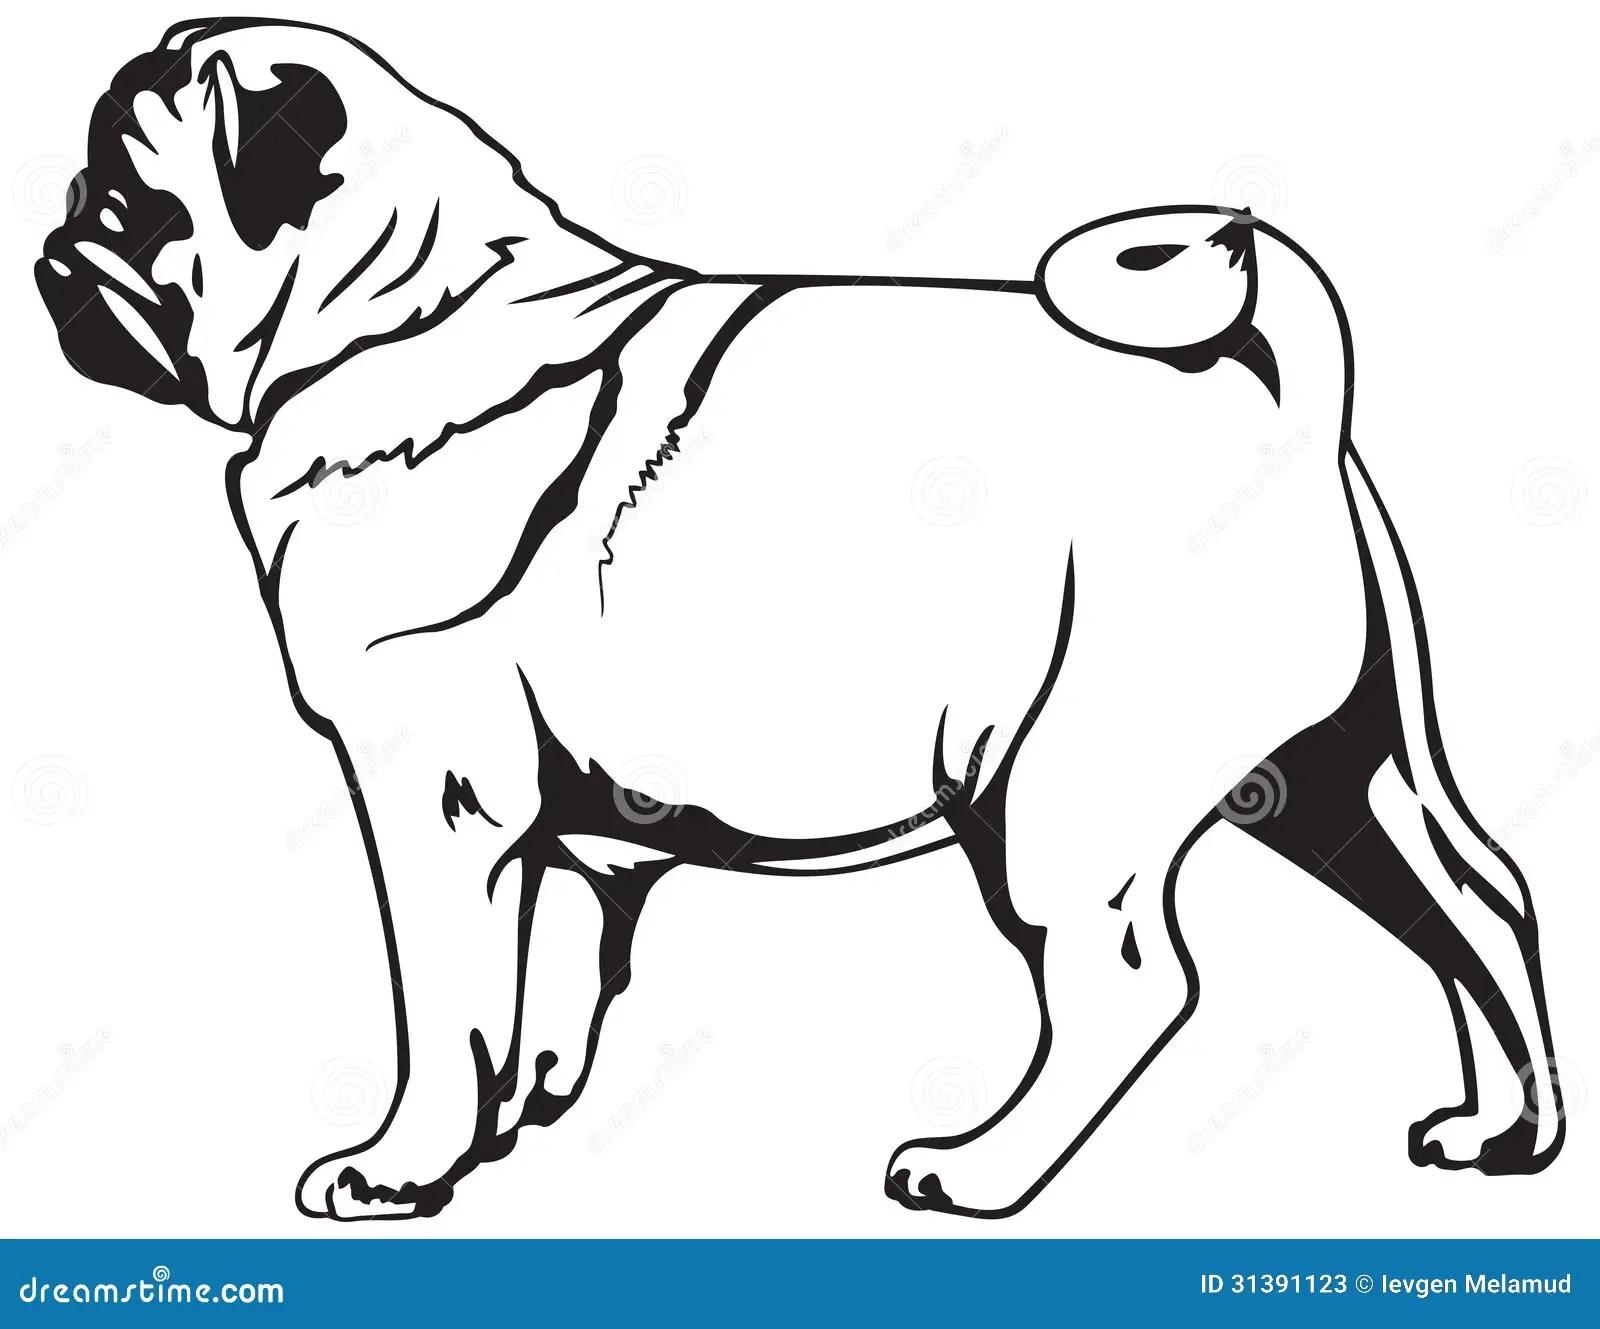 Pug Dog Breed Stock Photos